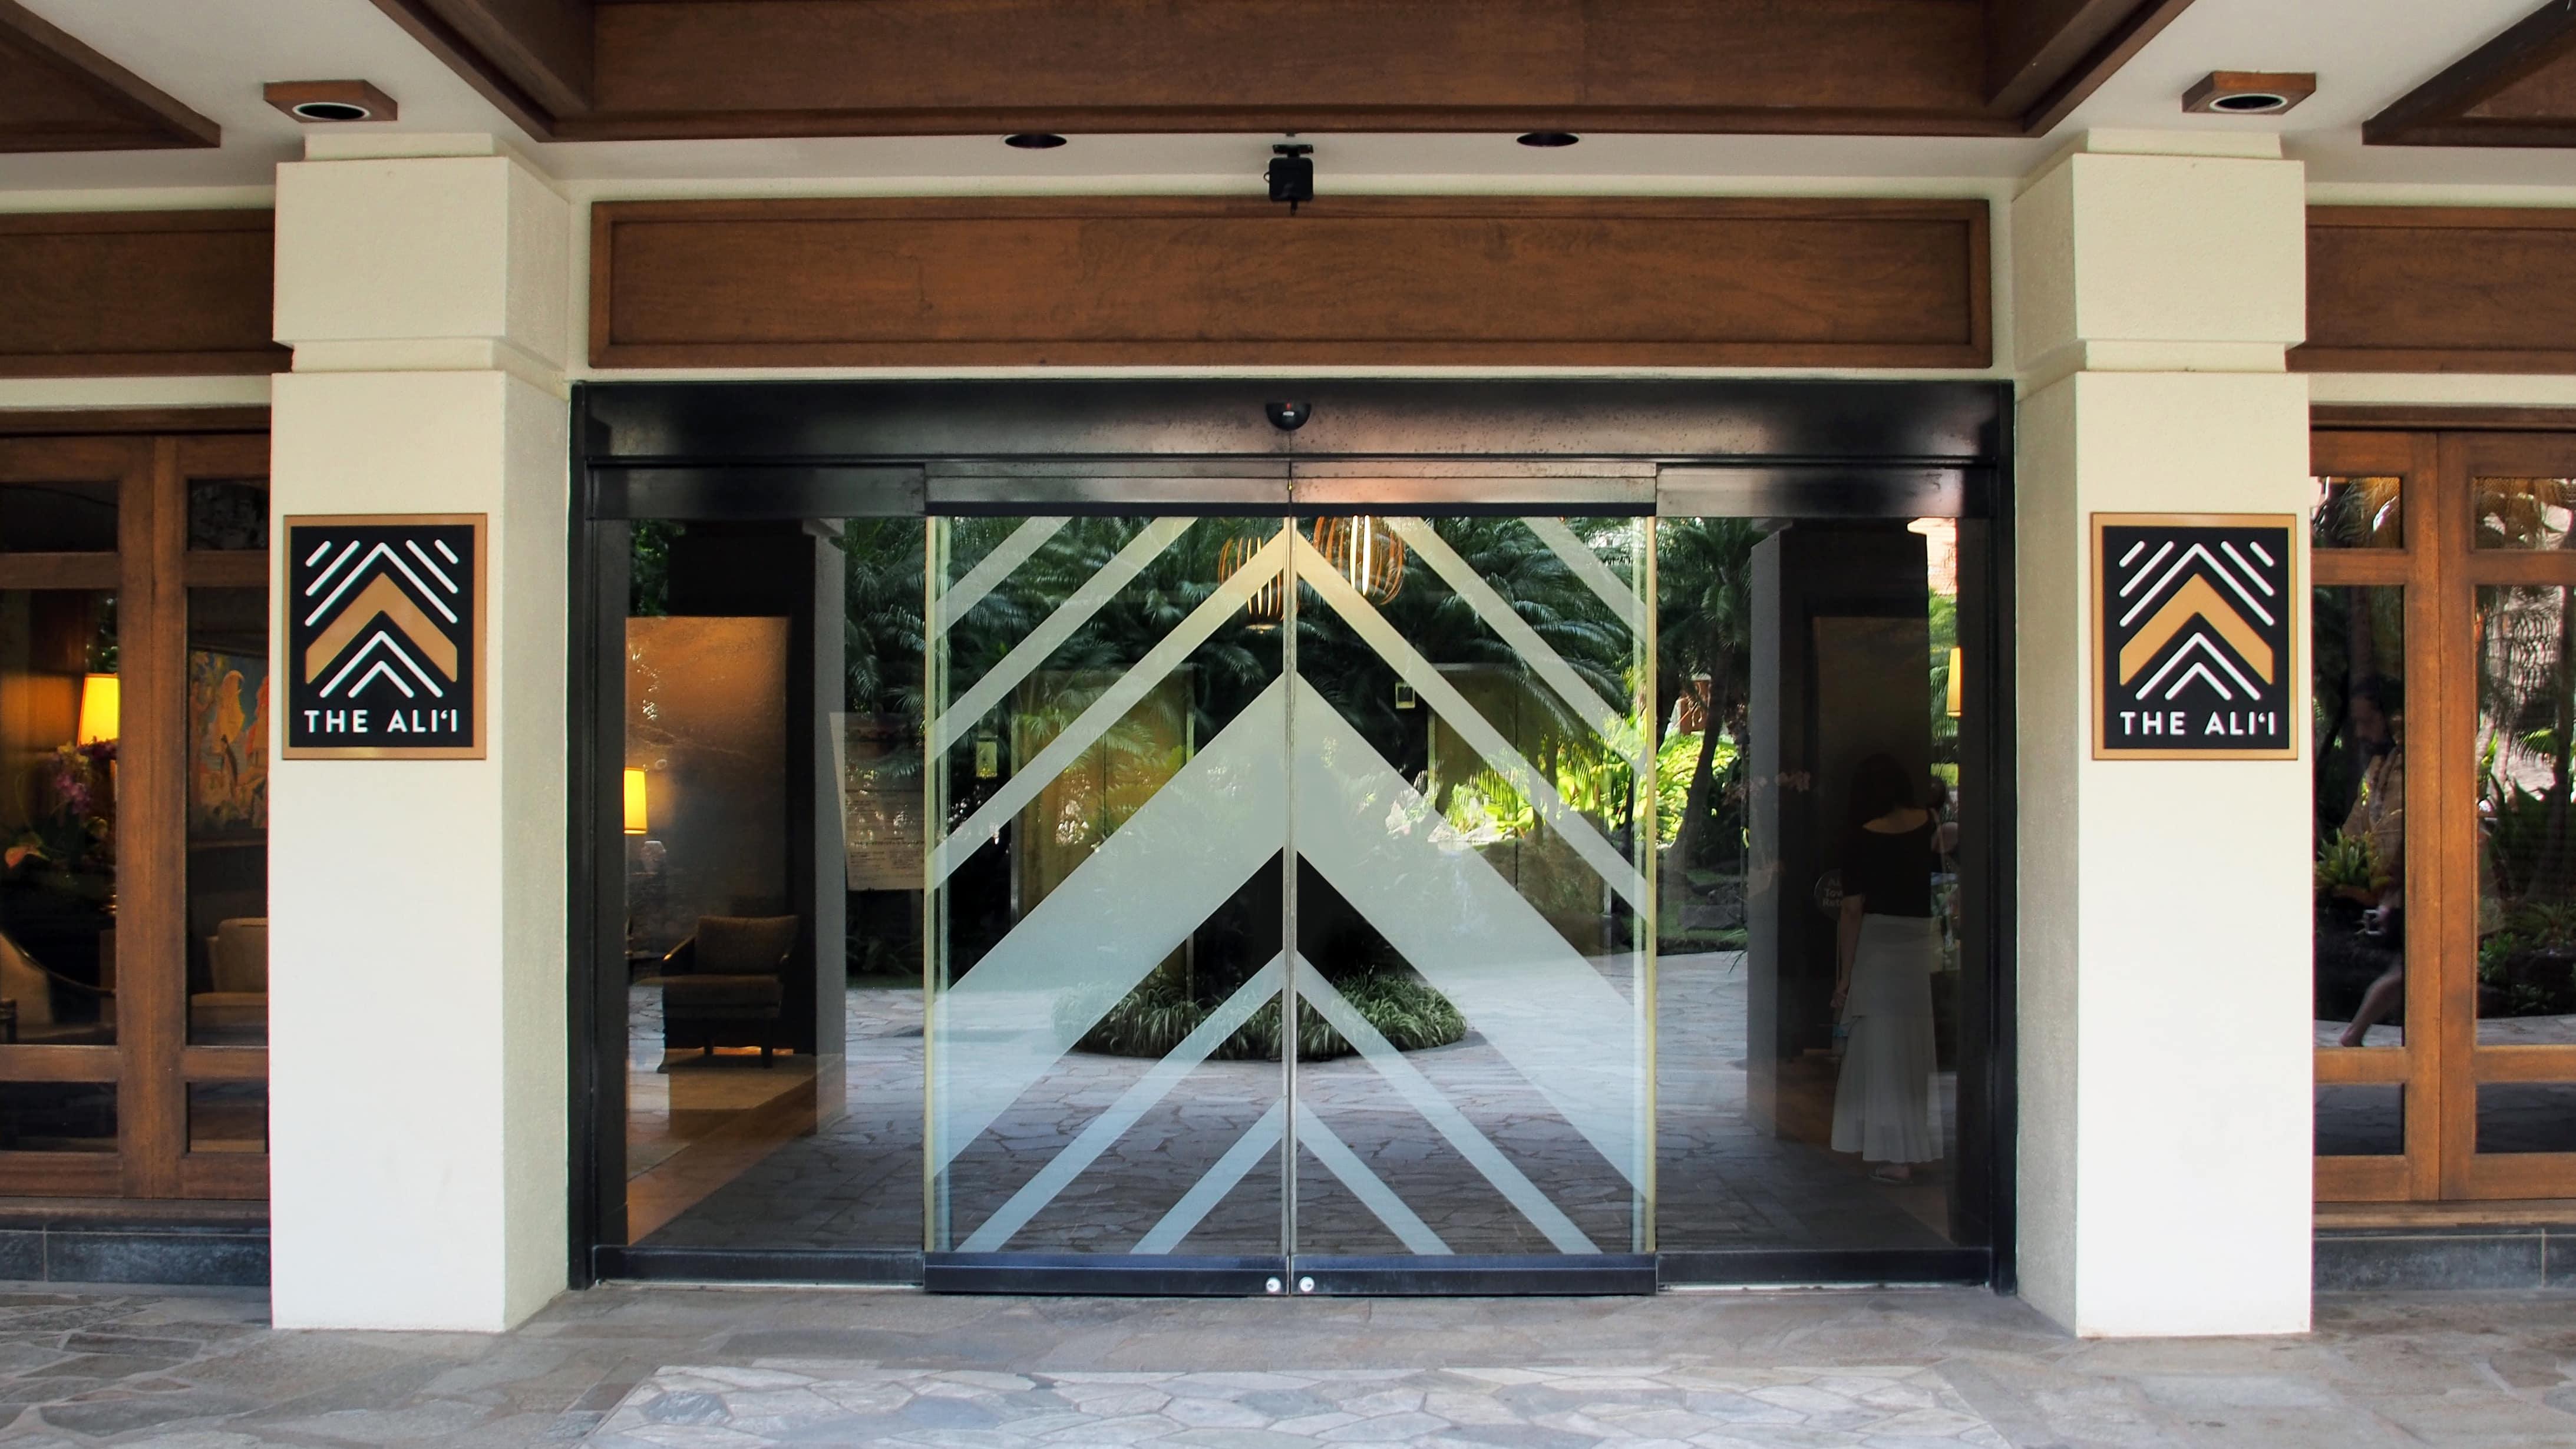 The Ali'i Entrance